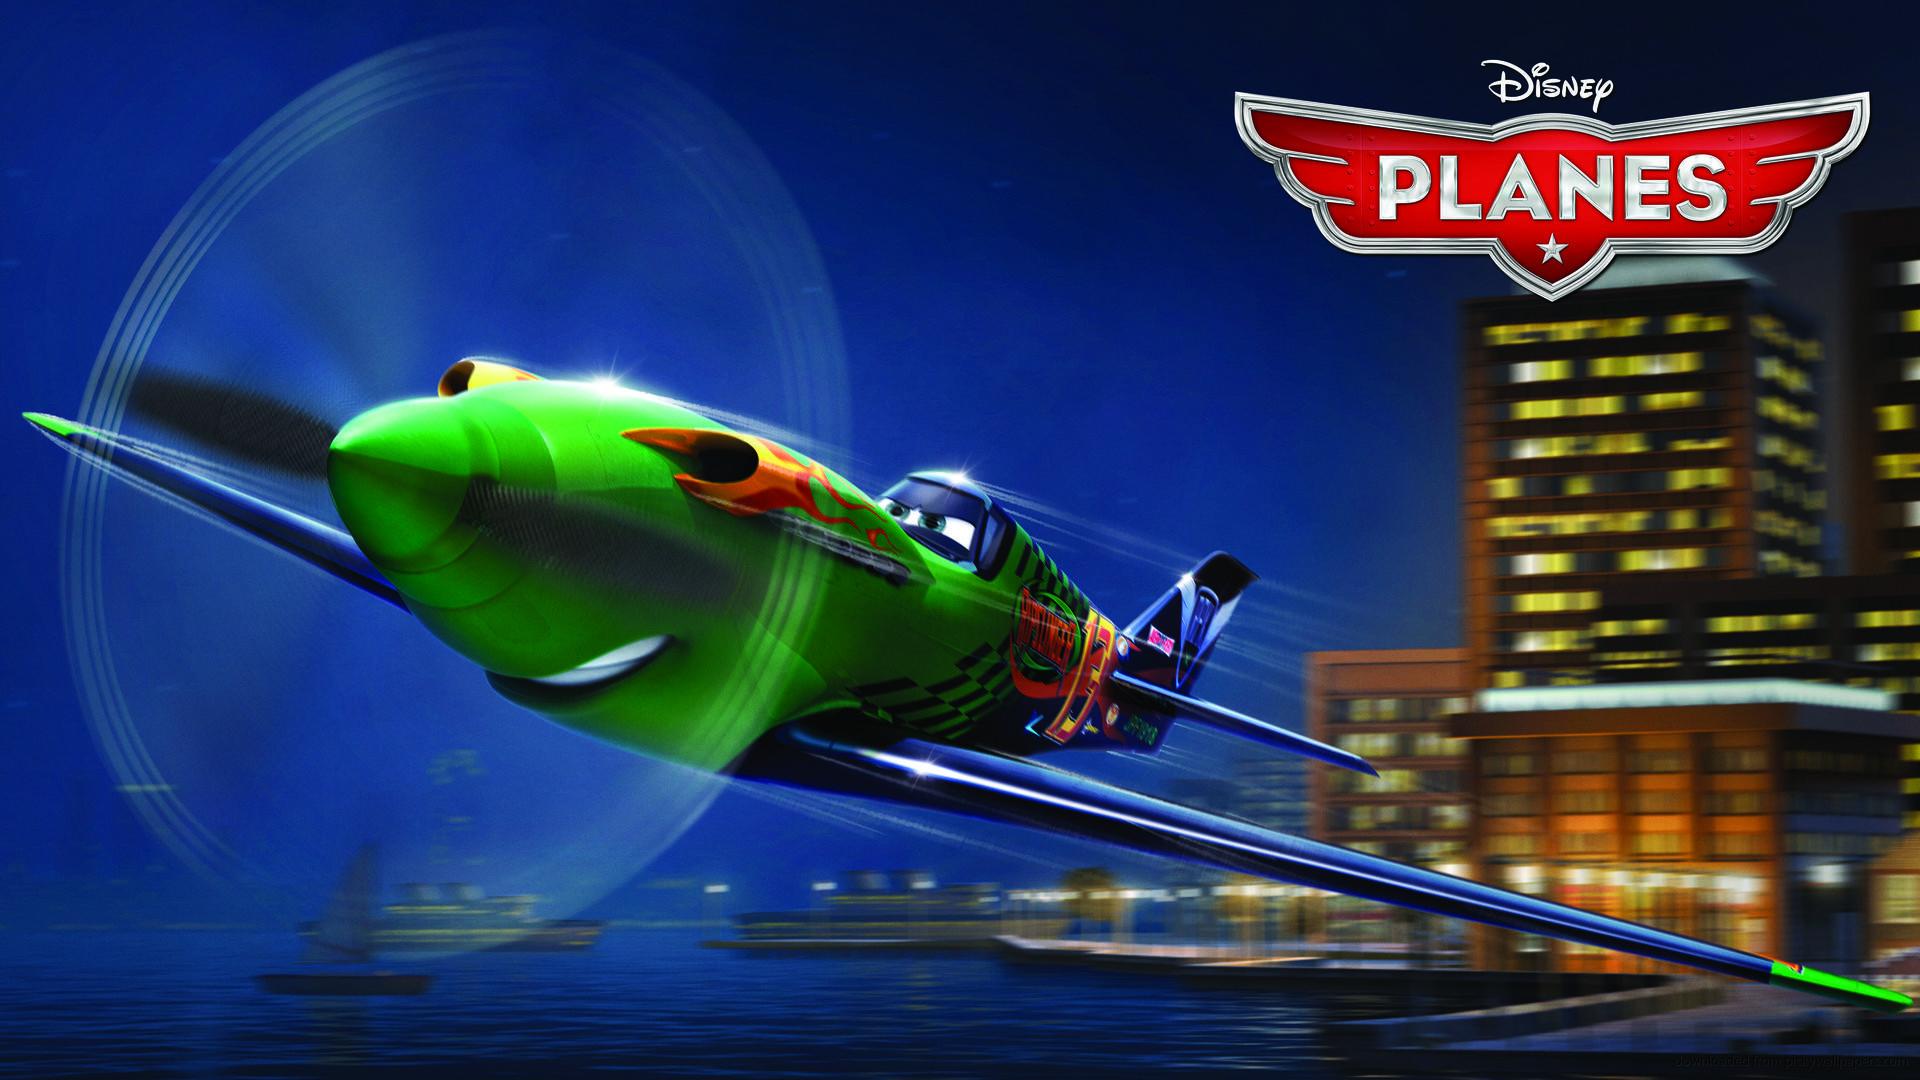 Disney Planes Movie Ripslinger Wide Wallpaper picture